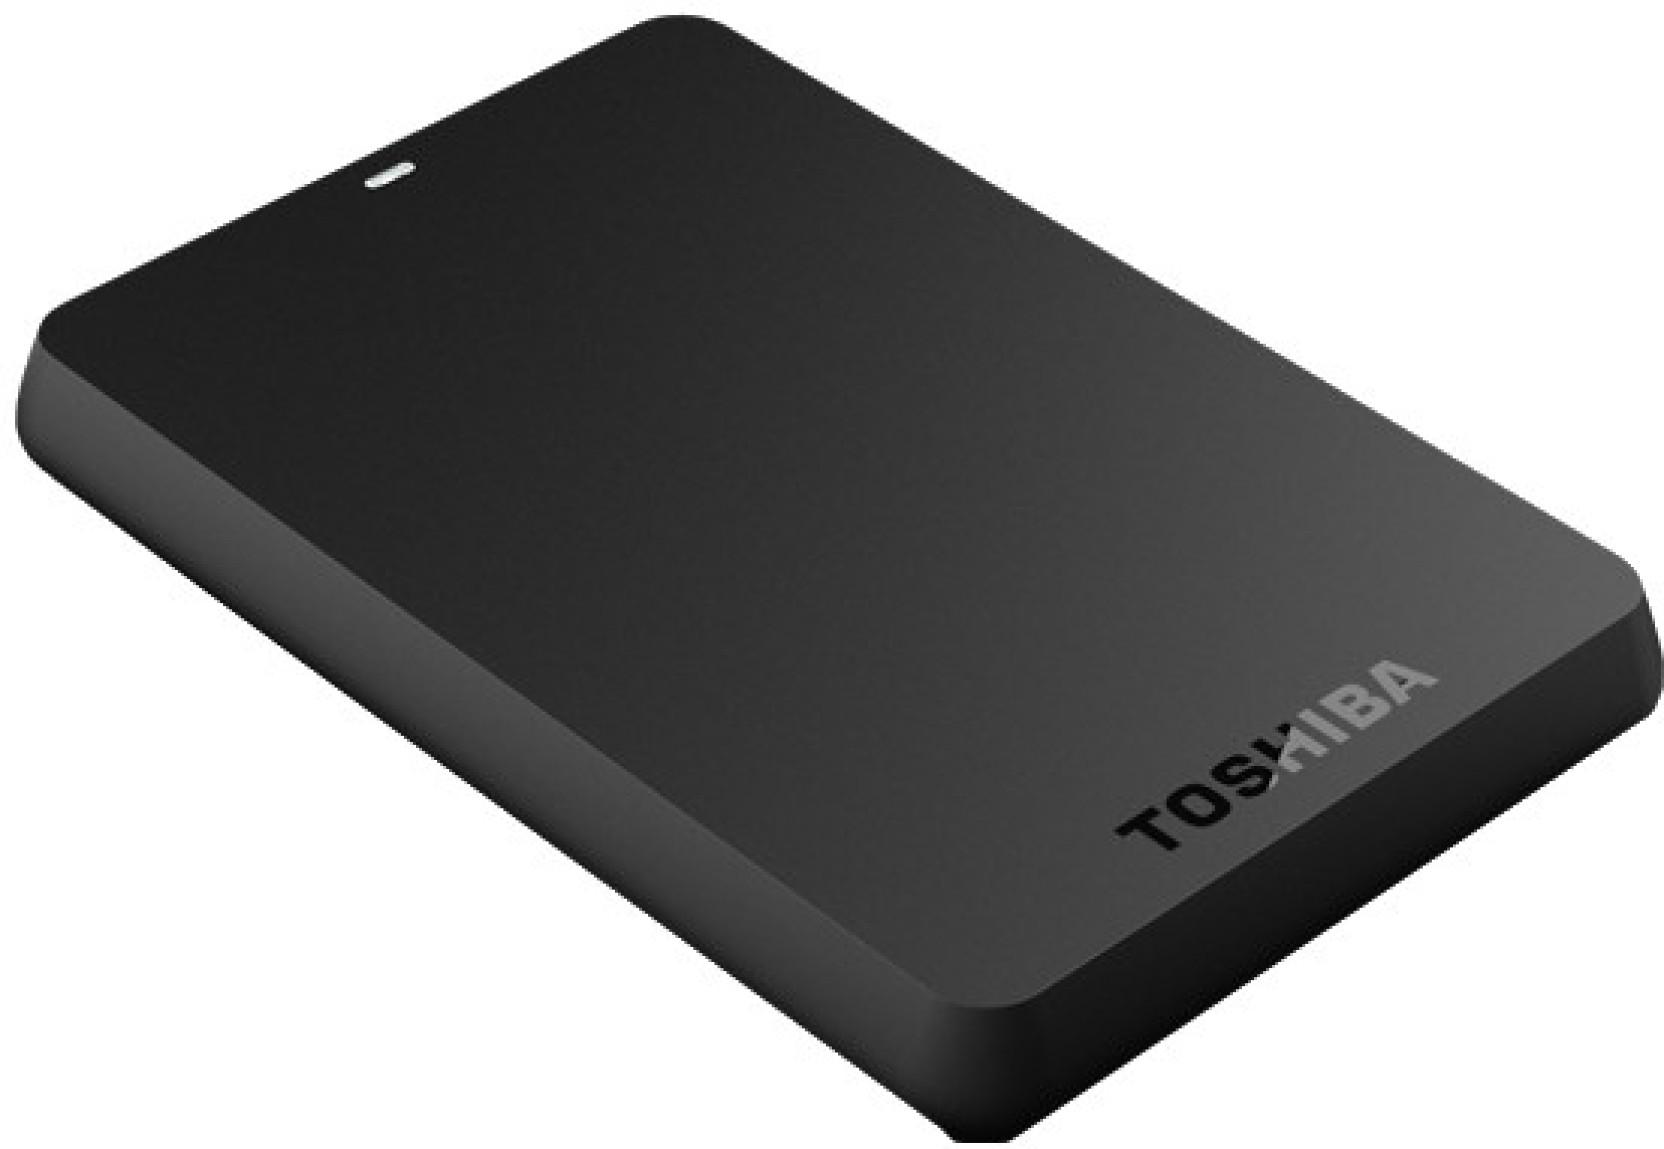 Toshiba Canvio Basic 500 GB External Hard Disk - Toshiba ...